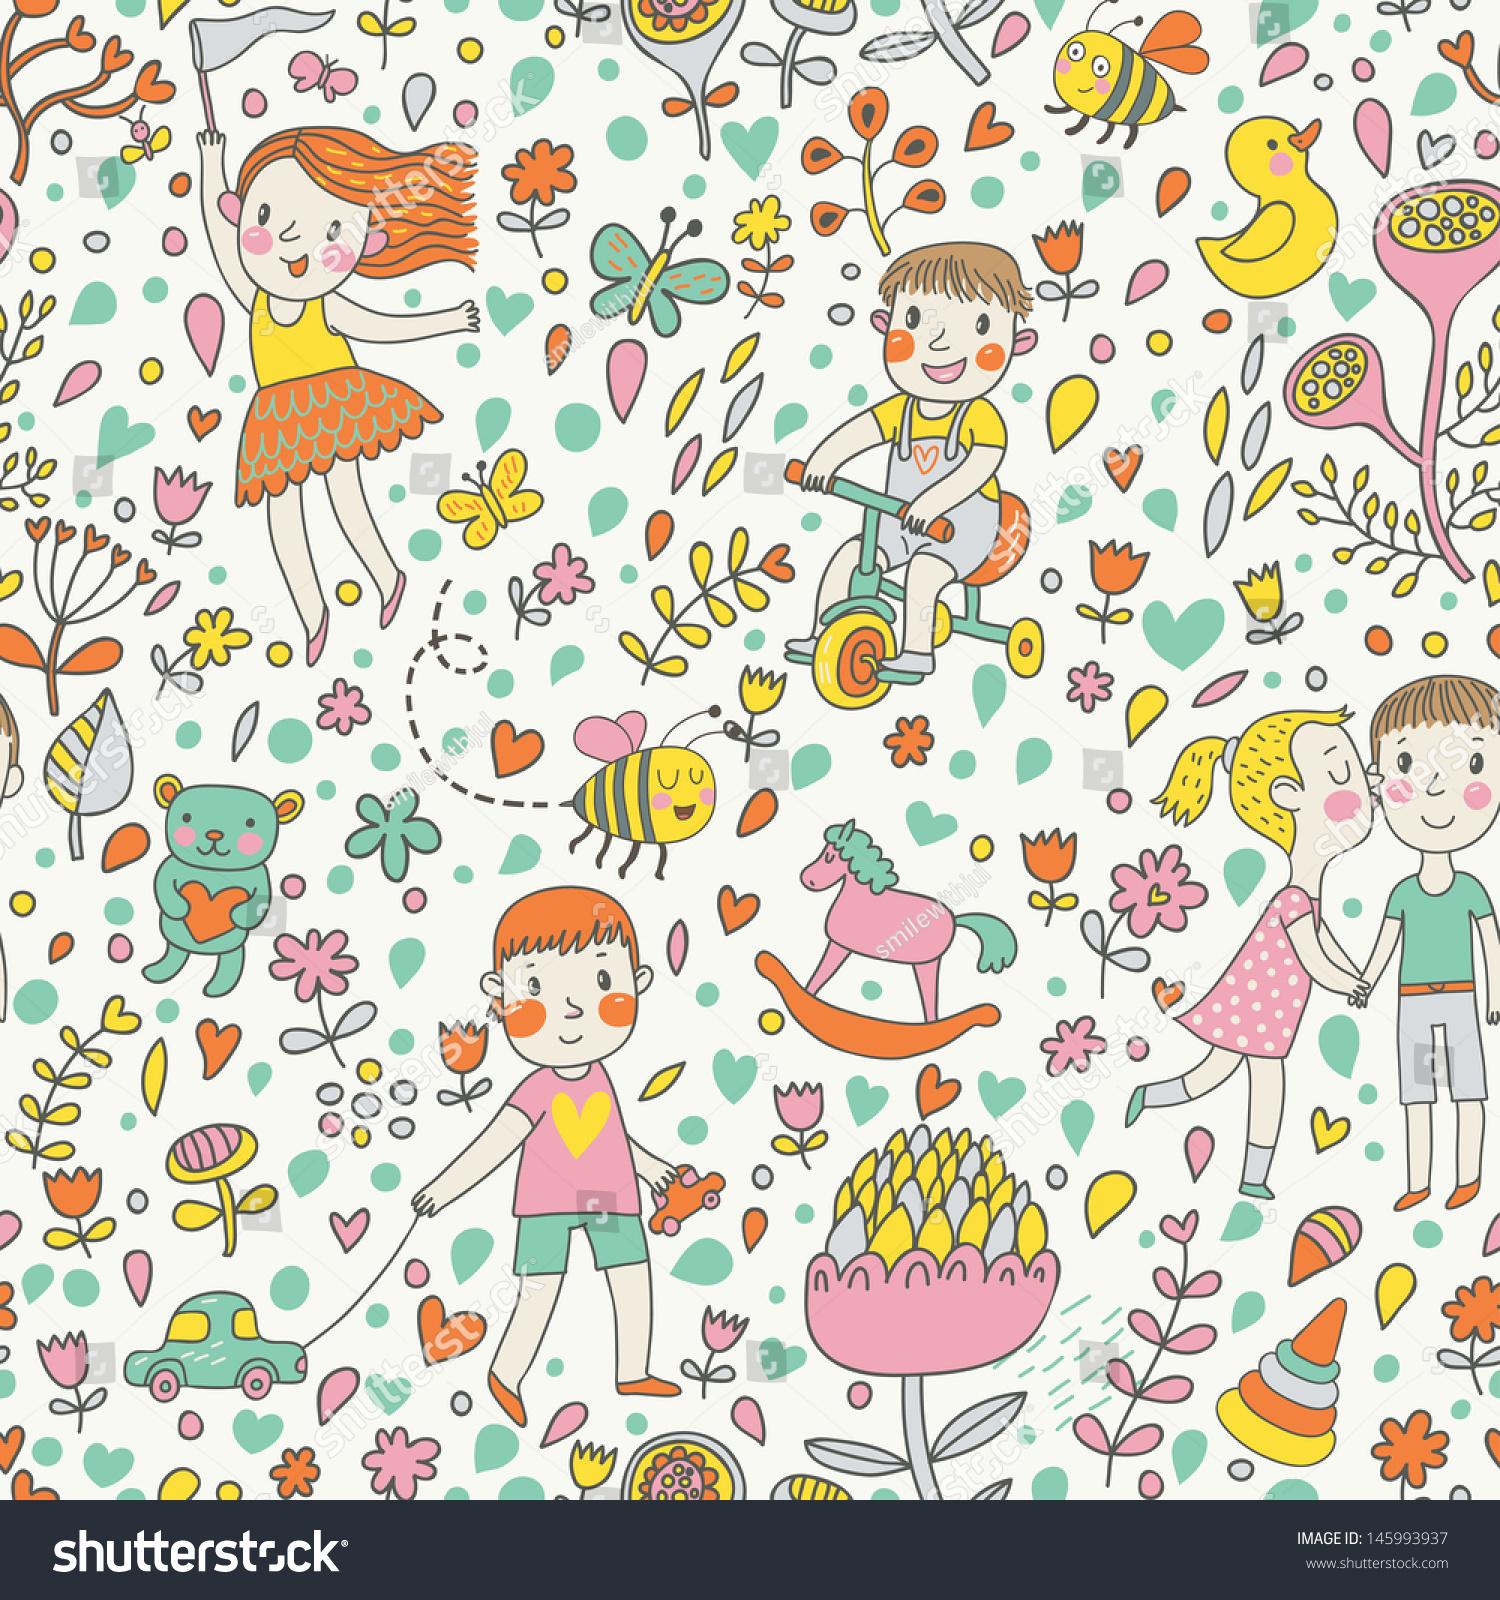 Cute Baby Girl Child Wallpaper Cute Seamless Pattern Children Garden Playing Stock Vector